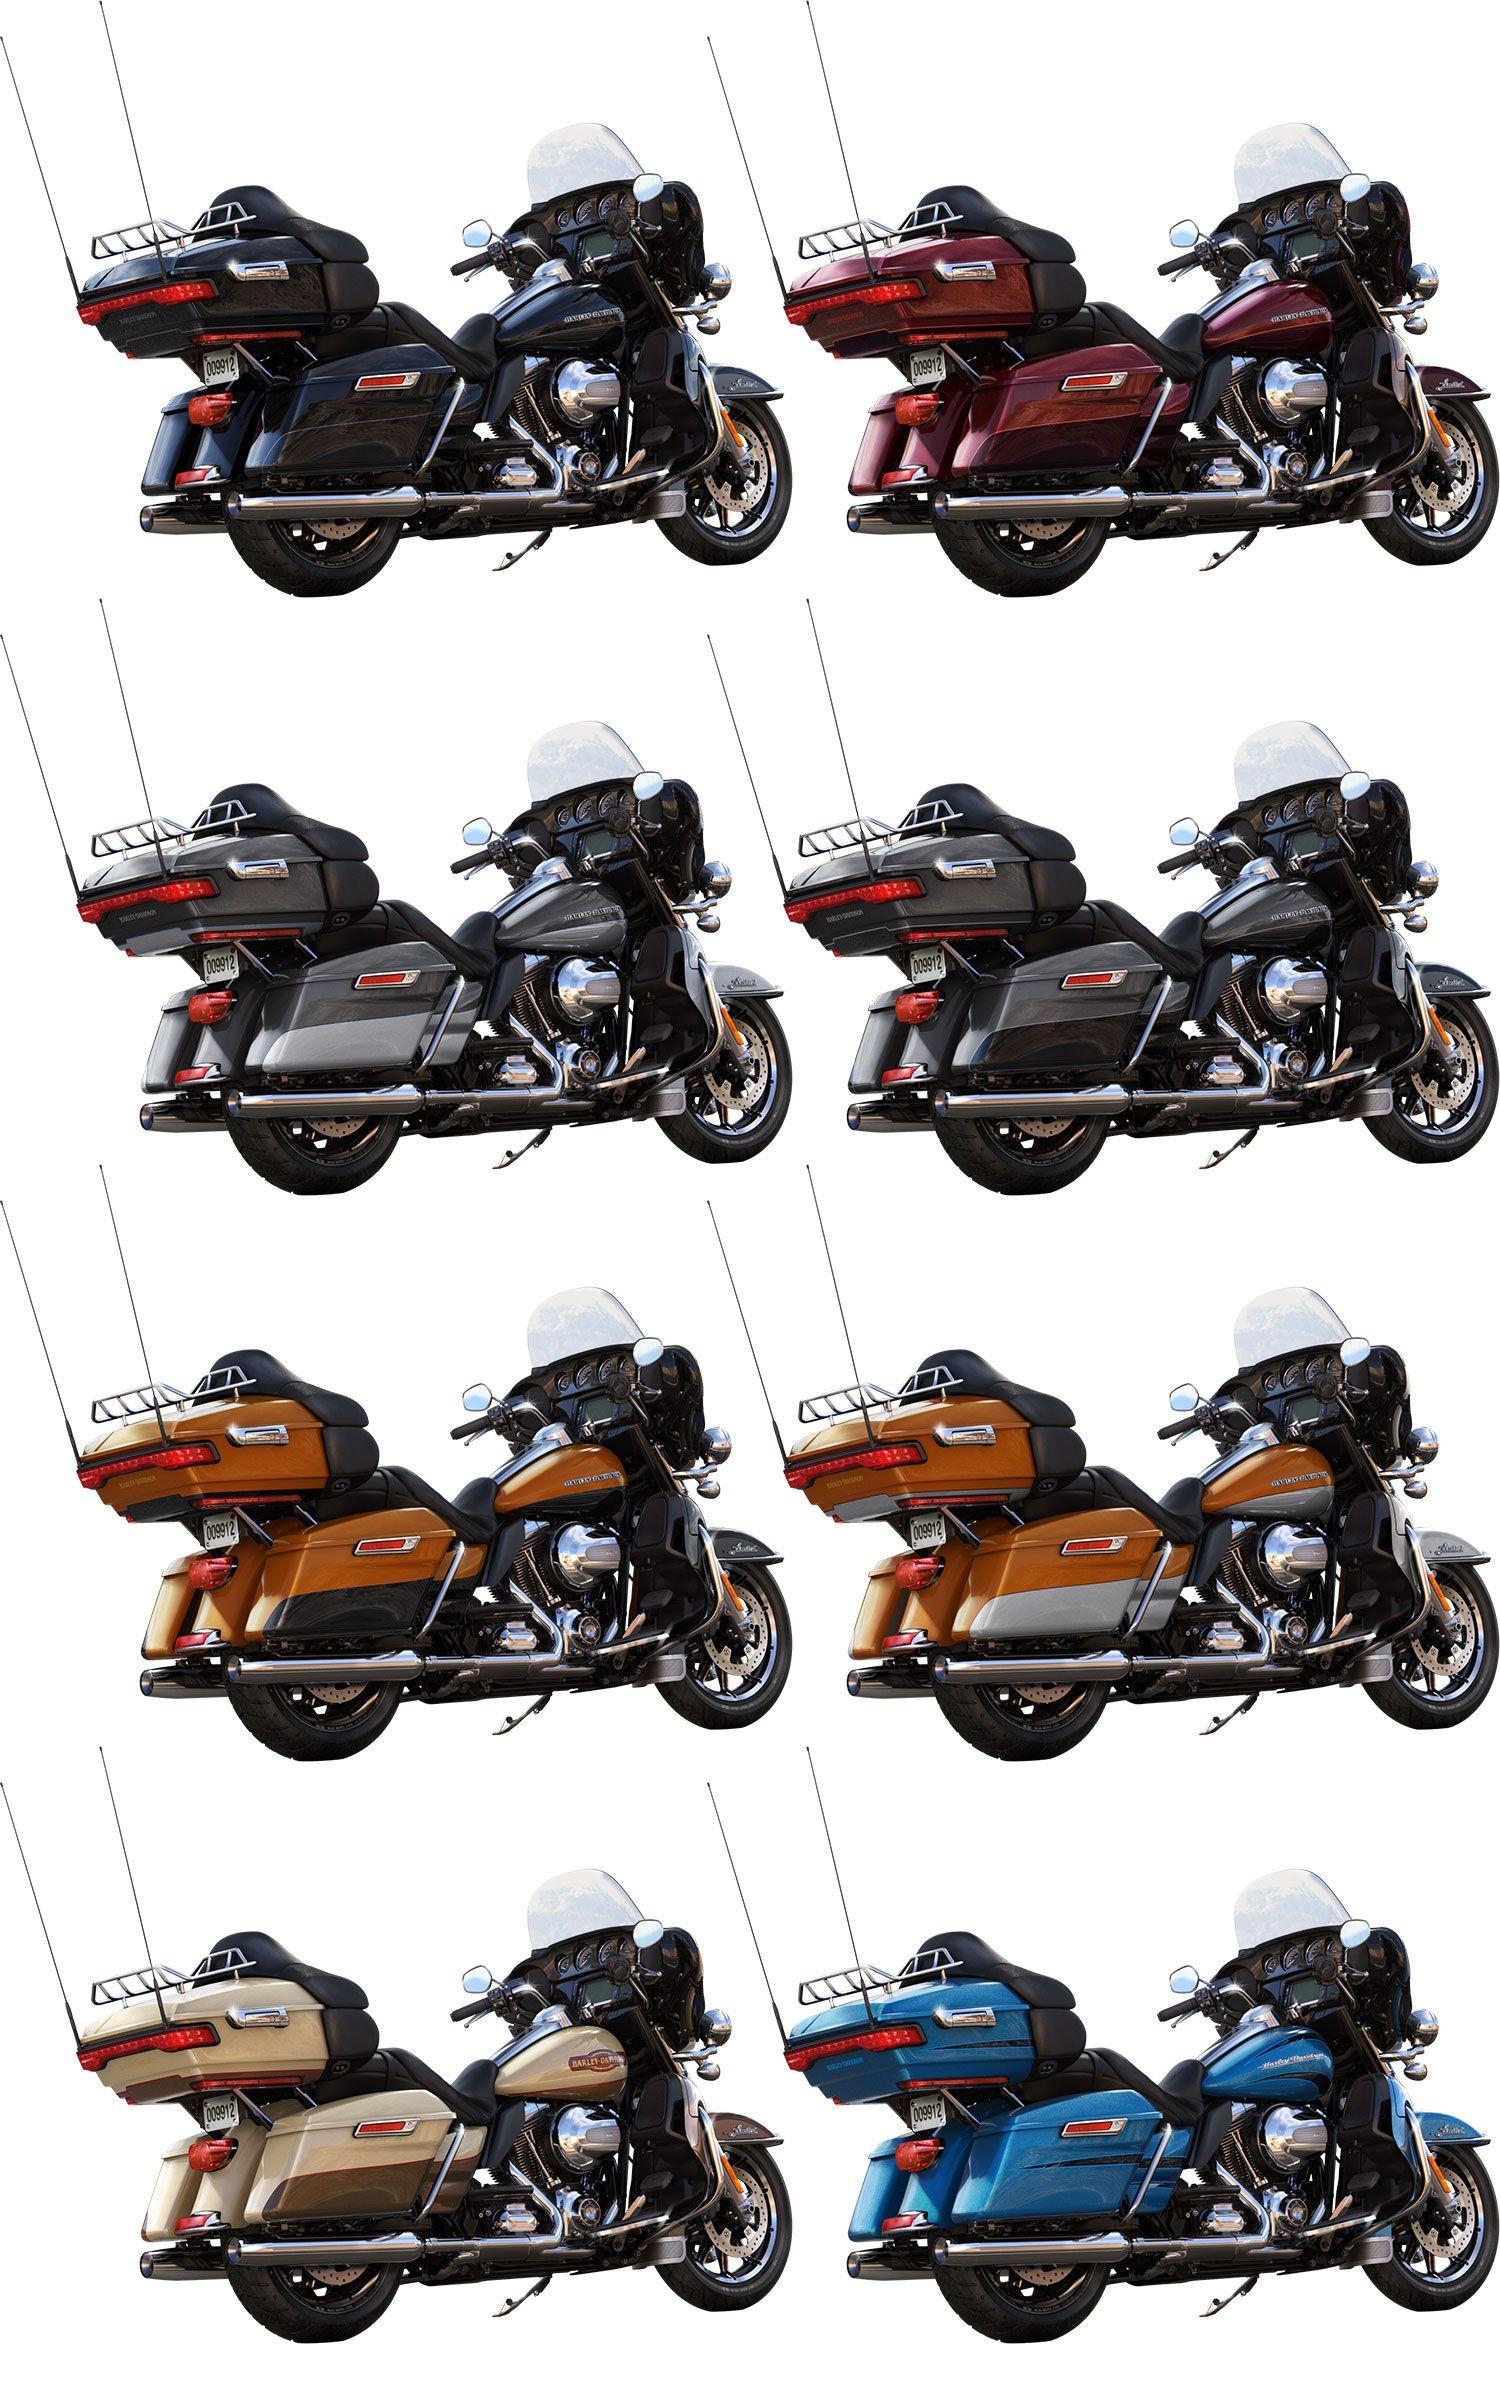 e965c48f Harley-Davidson 2014 Ultra Limited Colors | Harley Davidson | 2014 ...